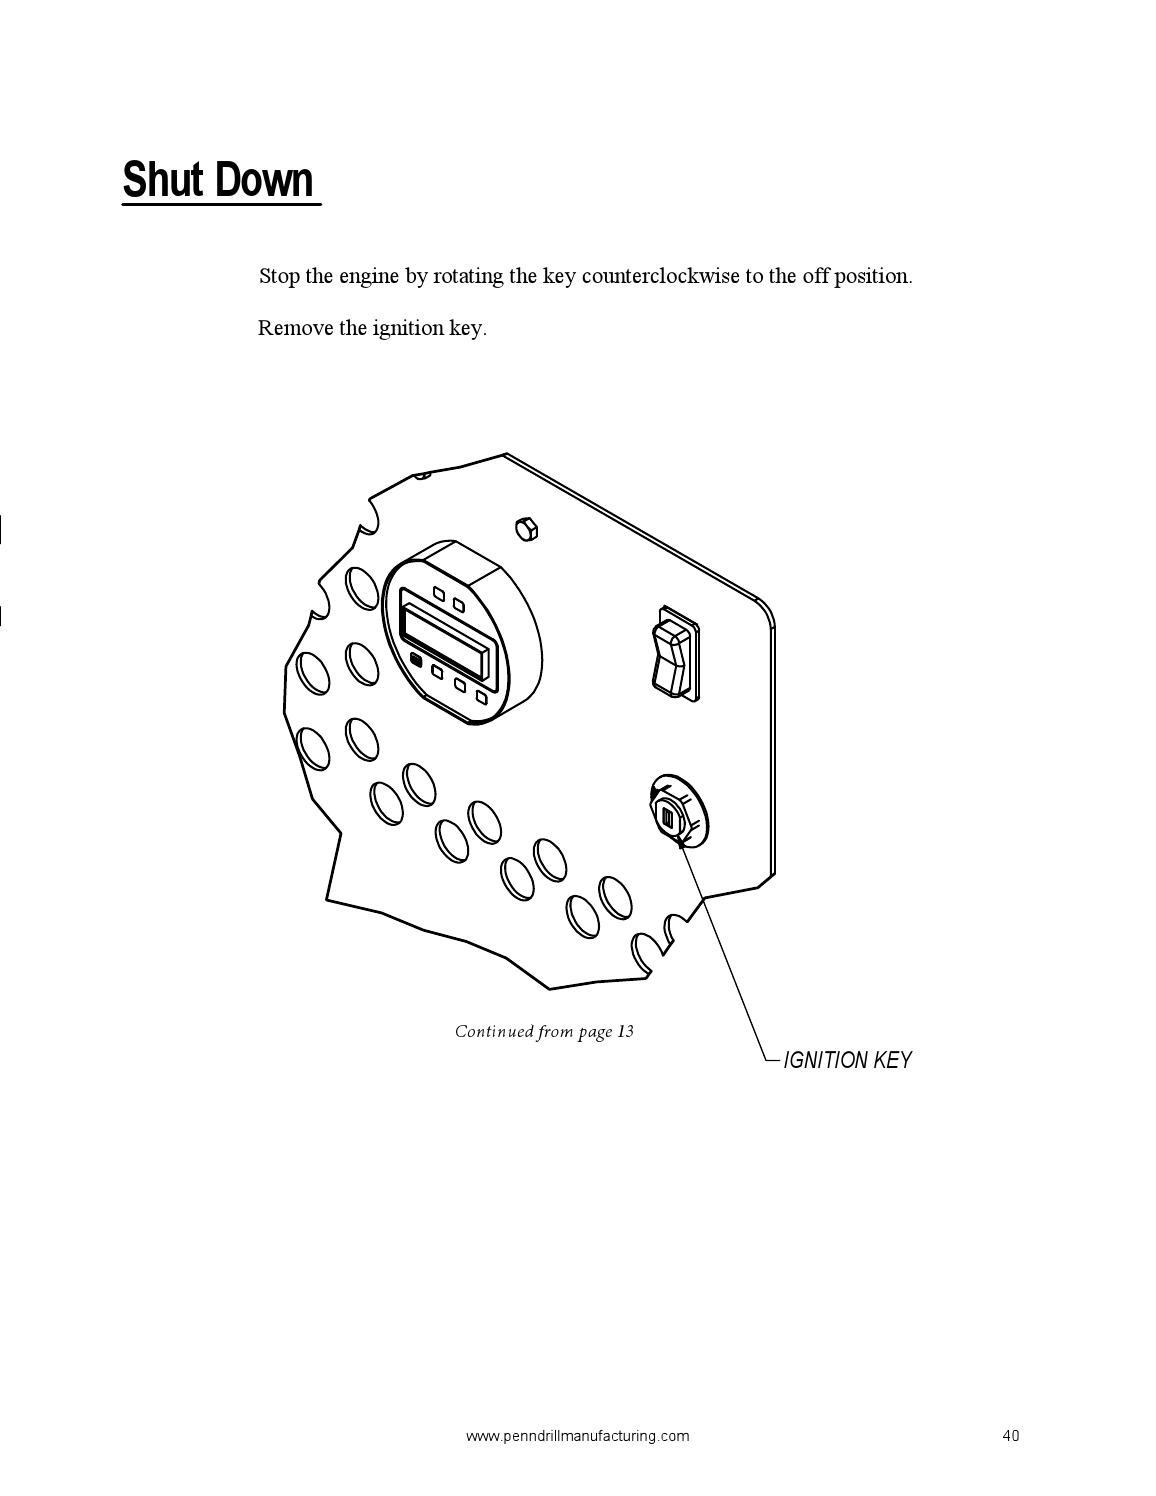 Parts operating manual pd1011hd rev 14 by PennDrill